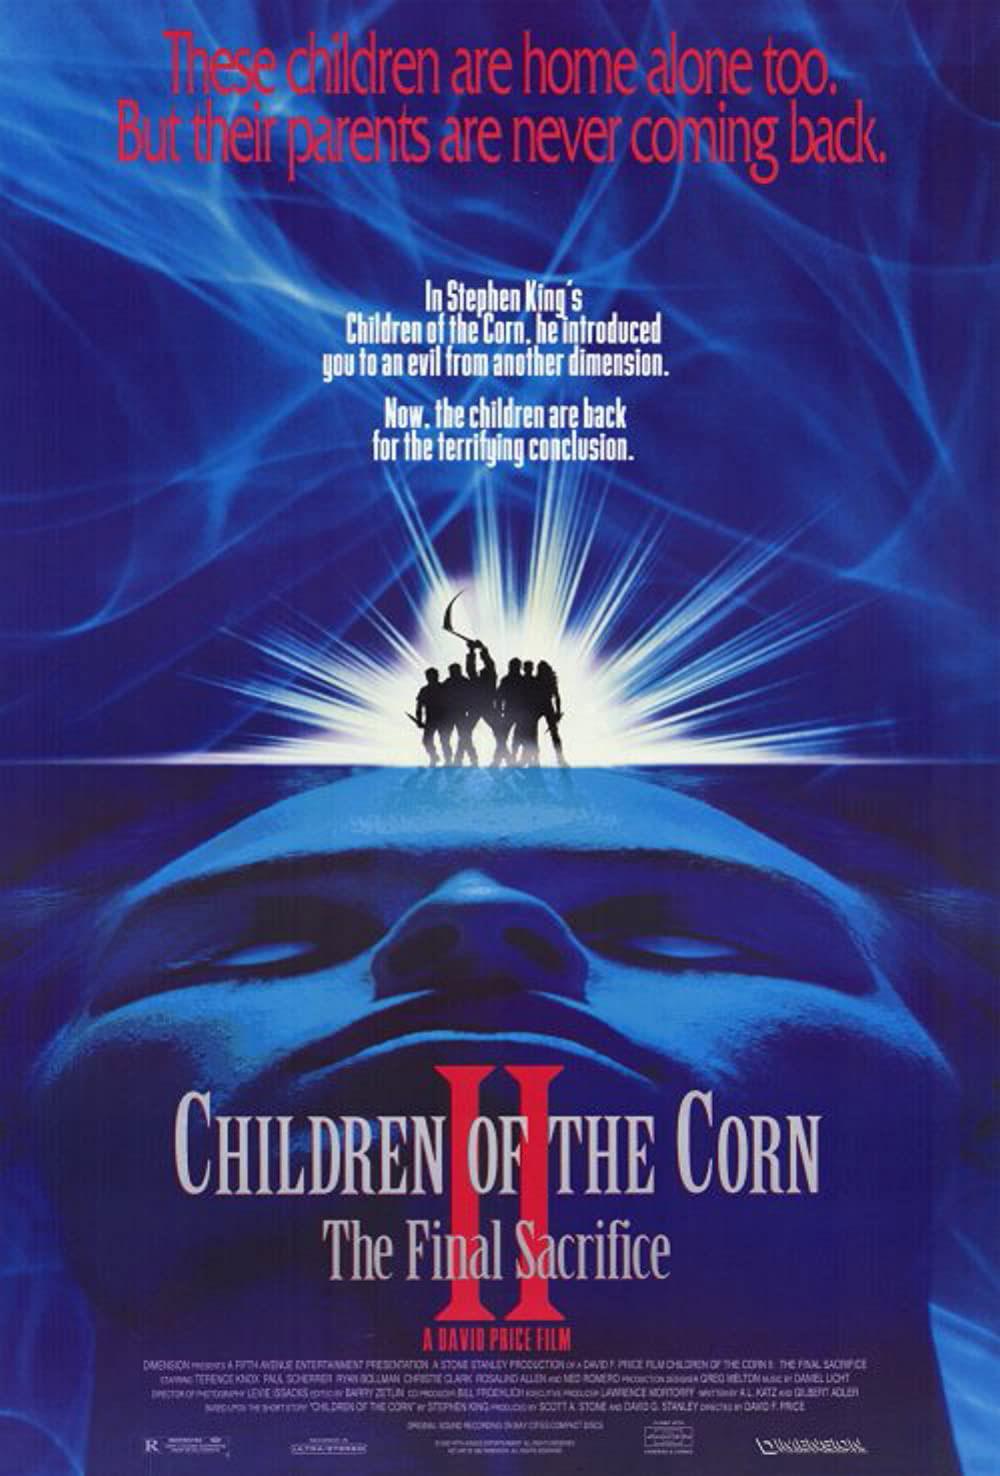 Children of the Corn II: The Final Sacrifice movie poster